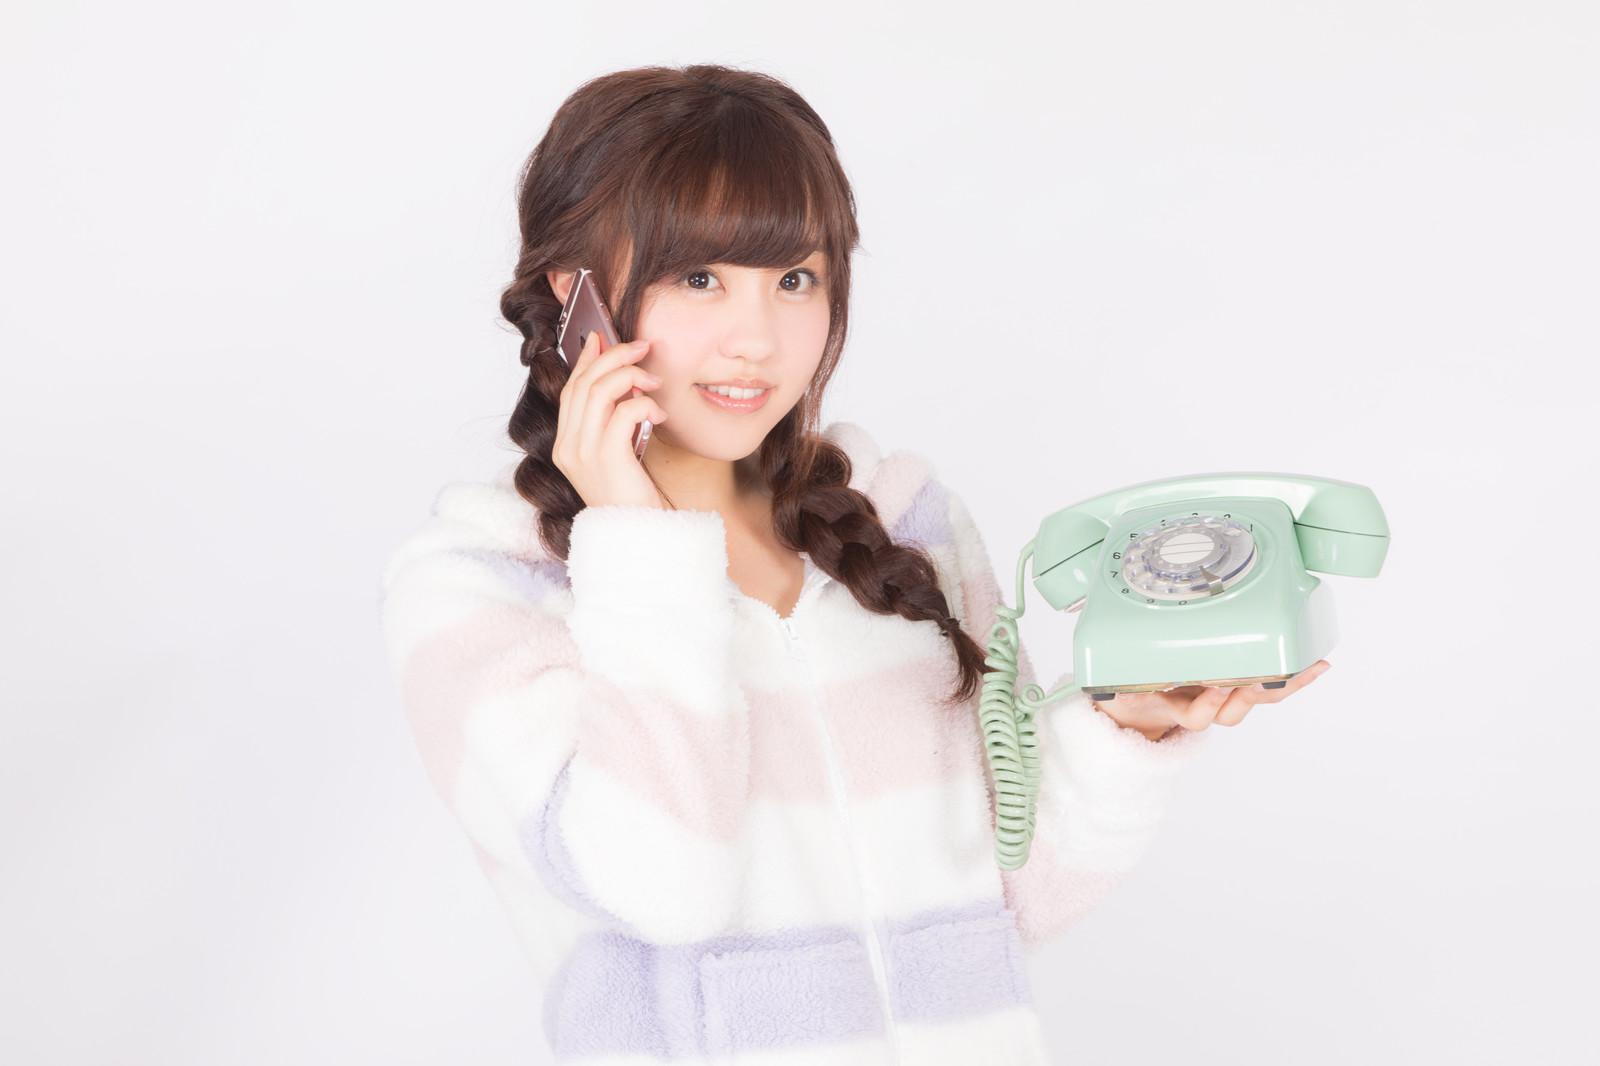 Yuka Calling Somebody on a phone pakutaso